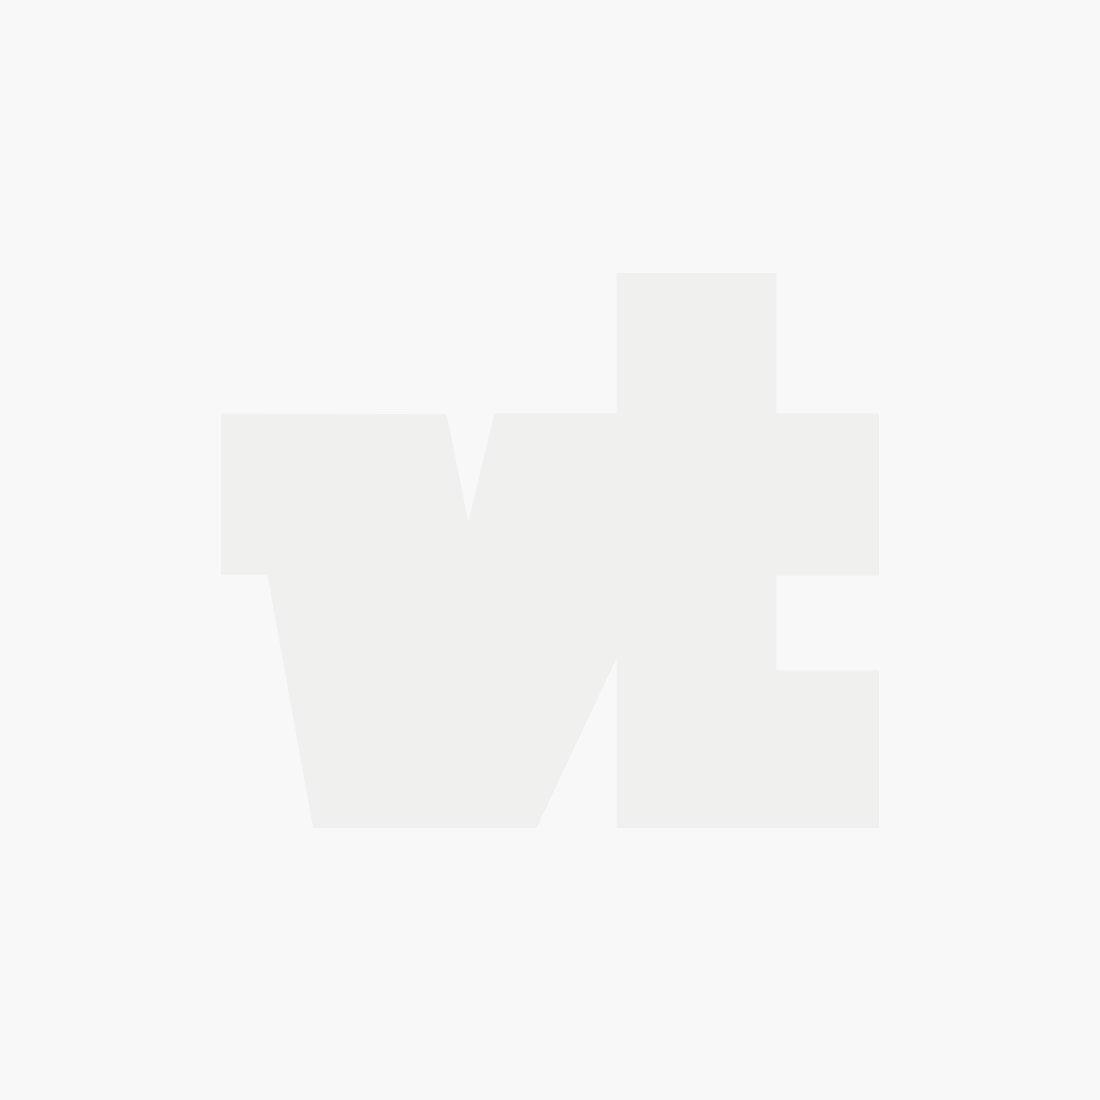 Knit colbert slimfit avio blue 7064